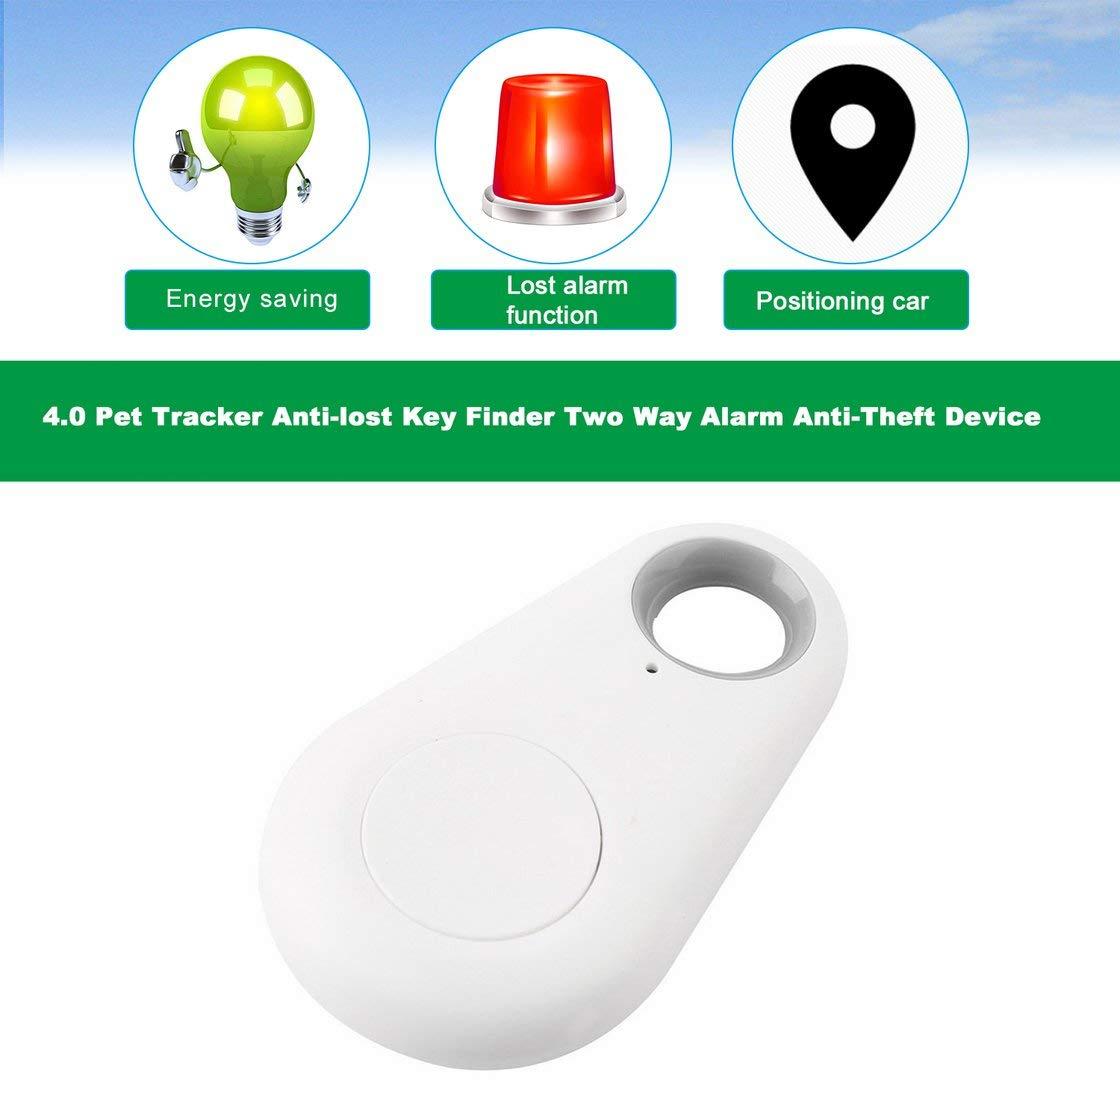 Mini Bluetooth 4.0 GPS Traker Waterdrop Localizador port/átil Anti-perdida Key Finder Pet Tracker Dispositivo de Alarma bidireccional Anti-Robo